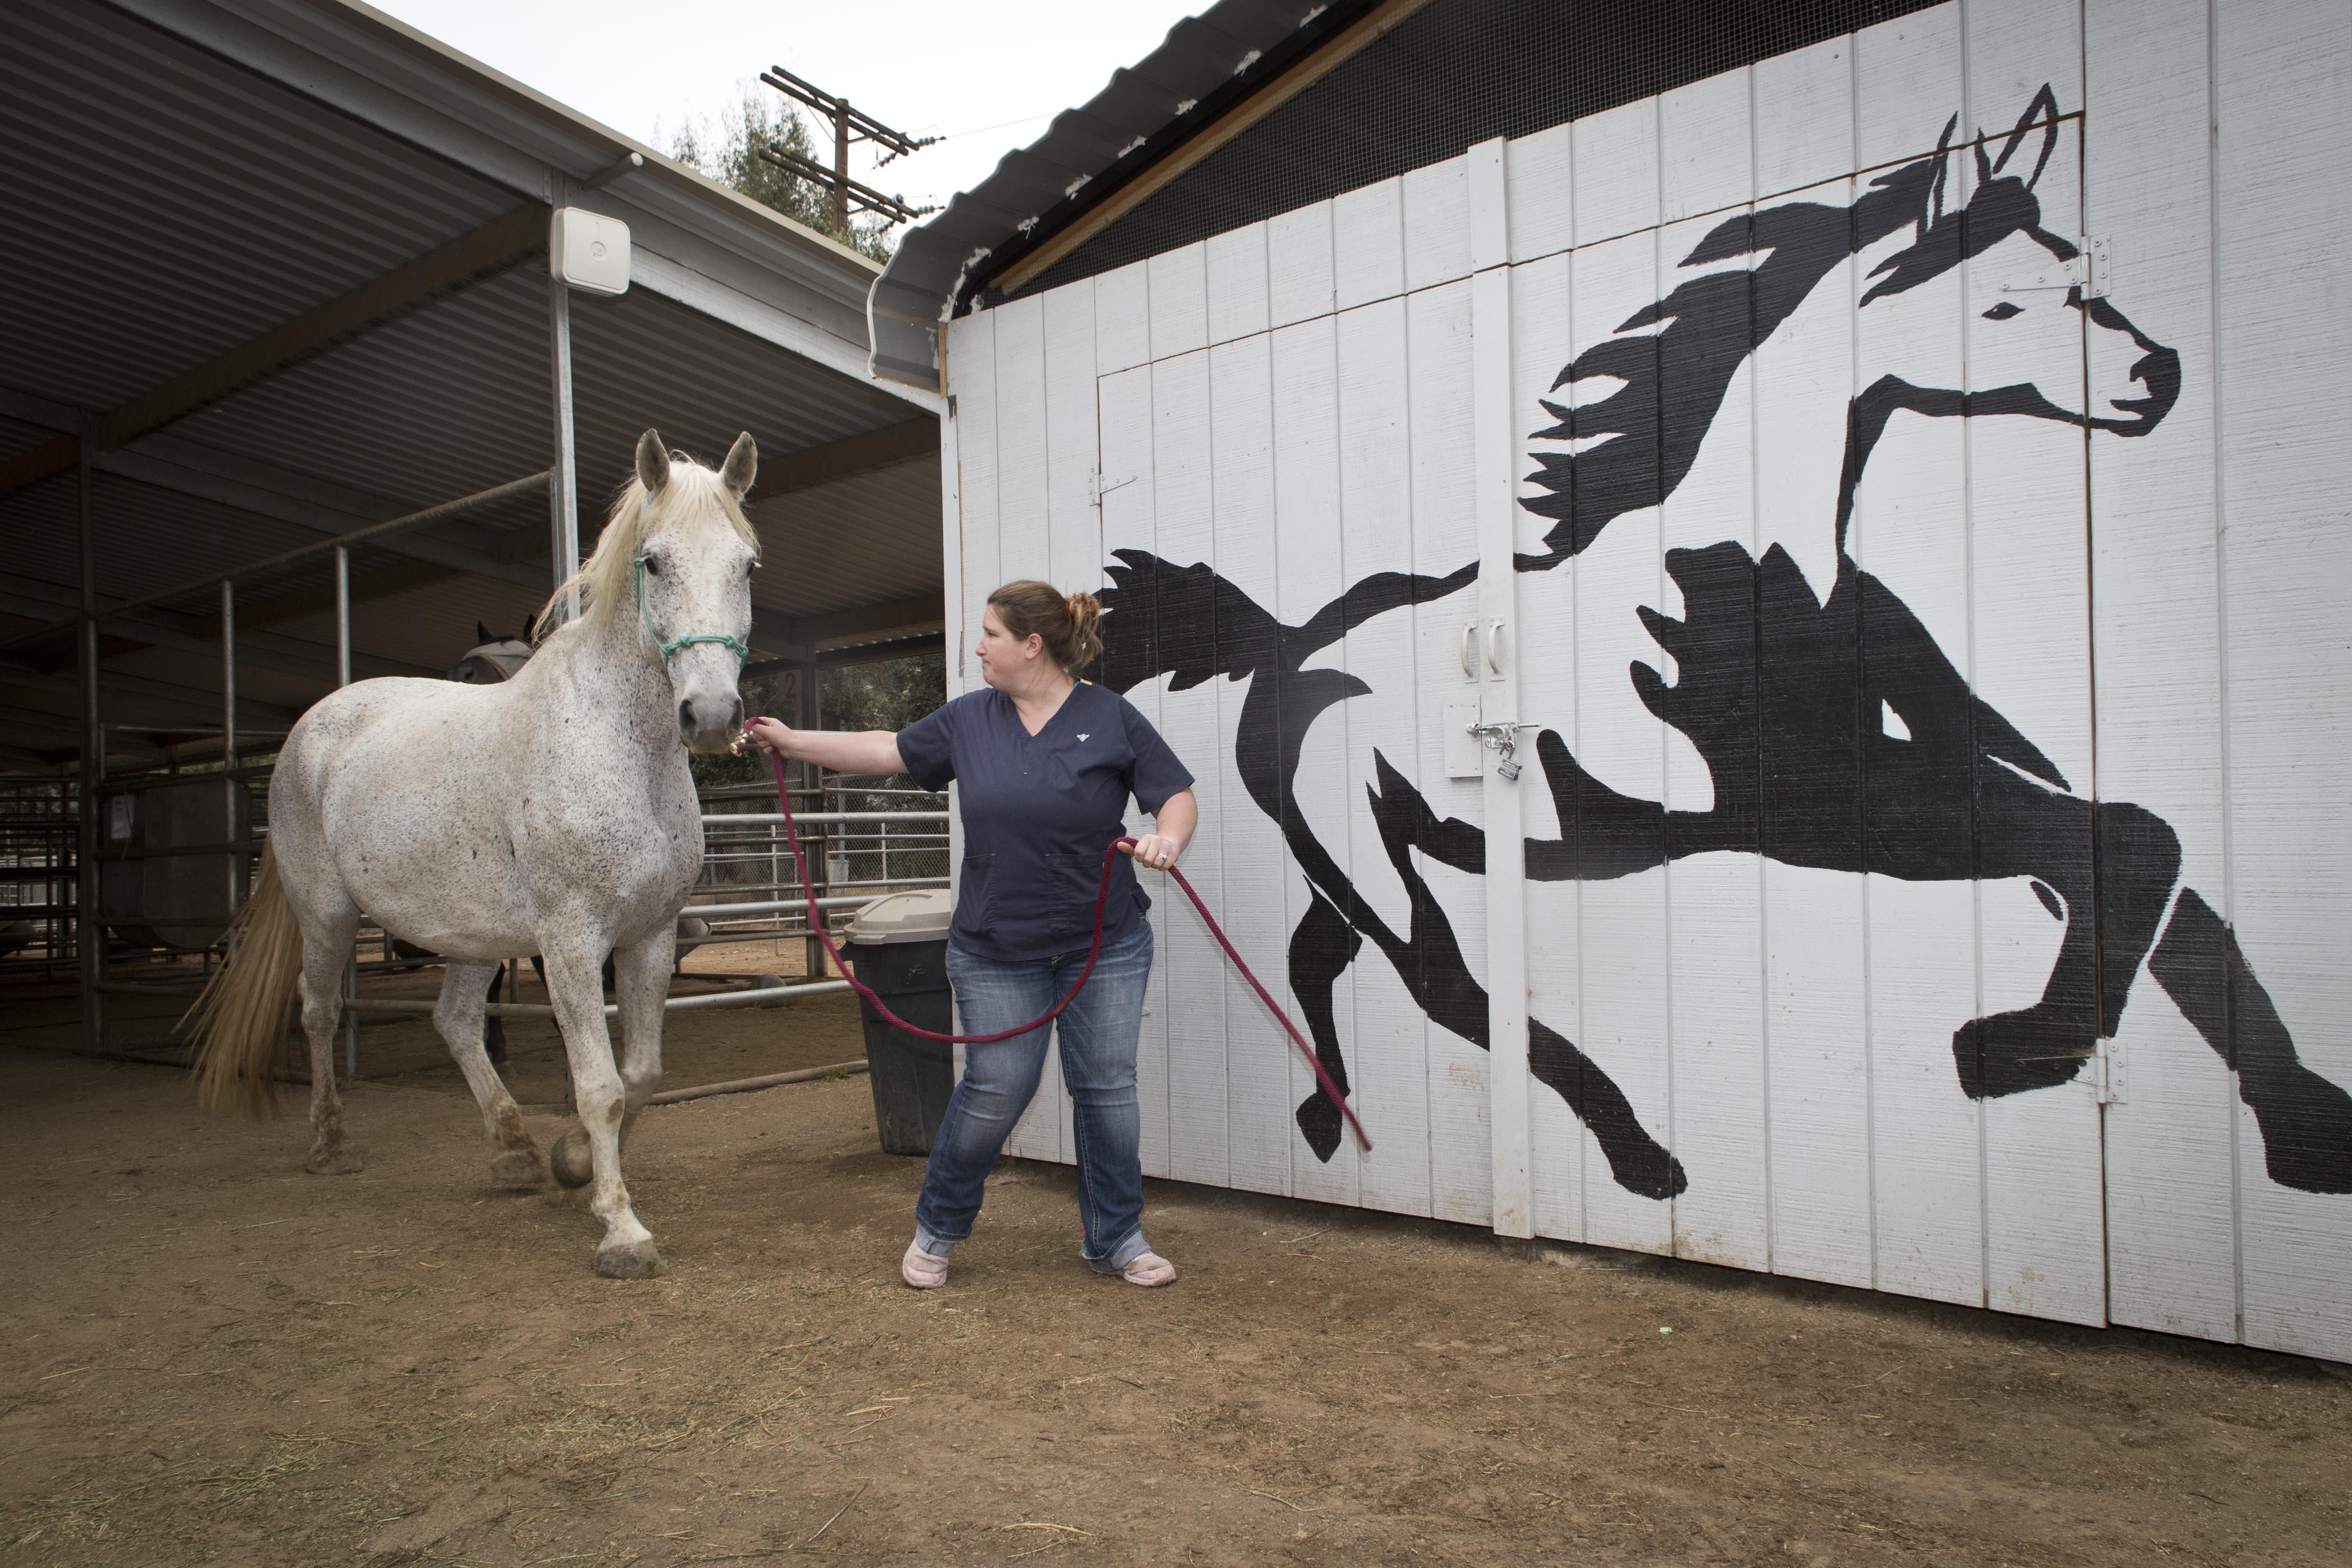 Peterson_Horses02.jpg